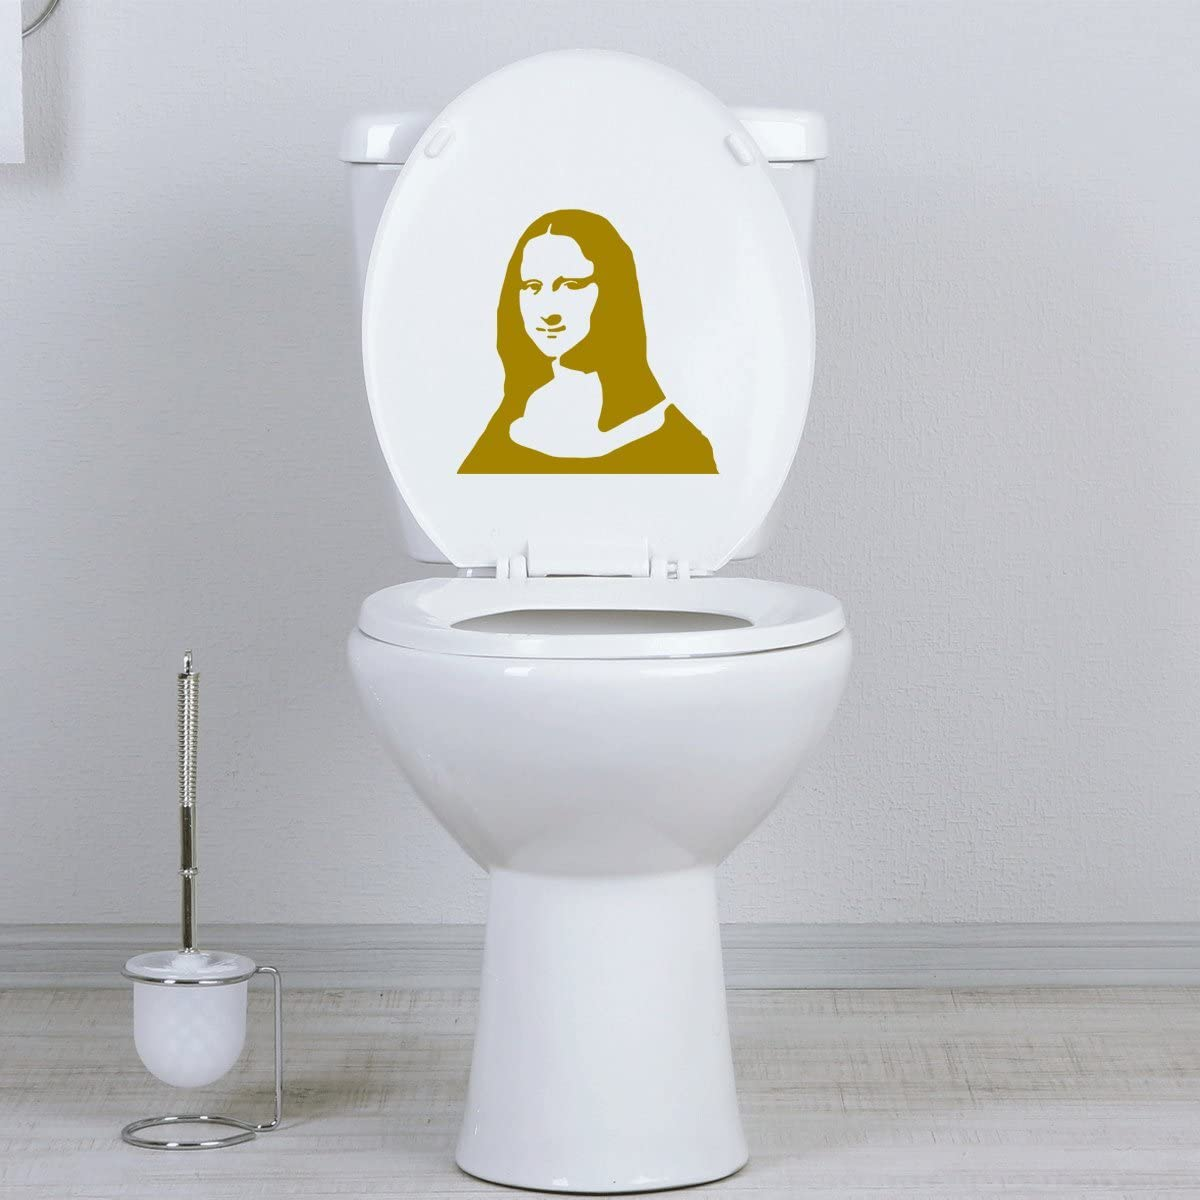 StickAny Bathroom Decal Series Mona Lisa Sticker for Toilet Bowl Black Seat Bath